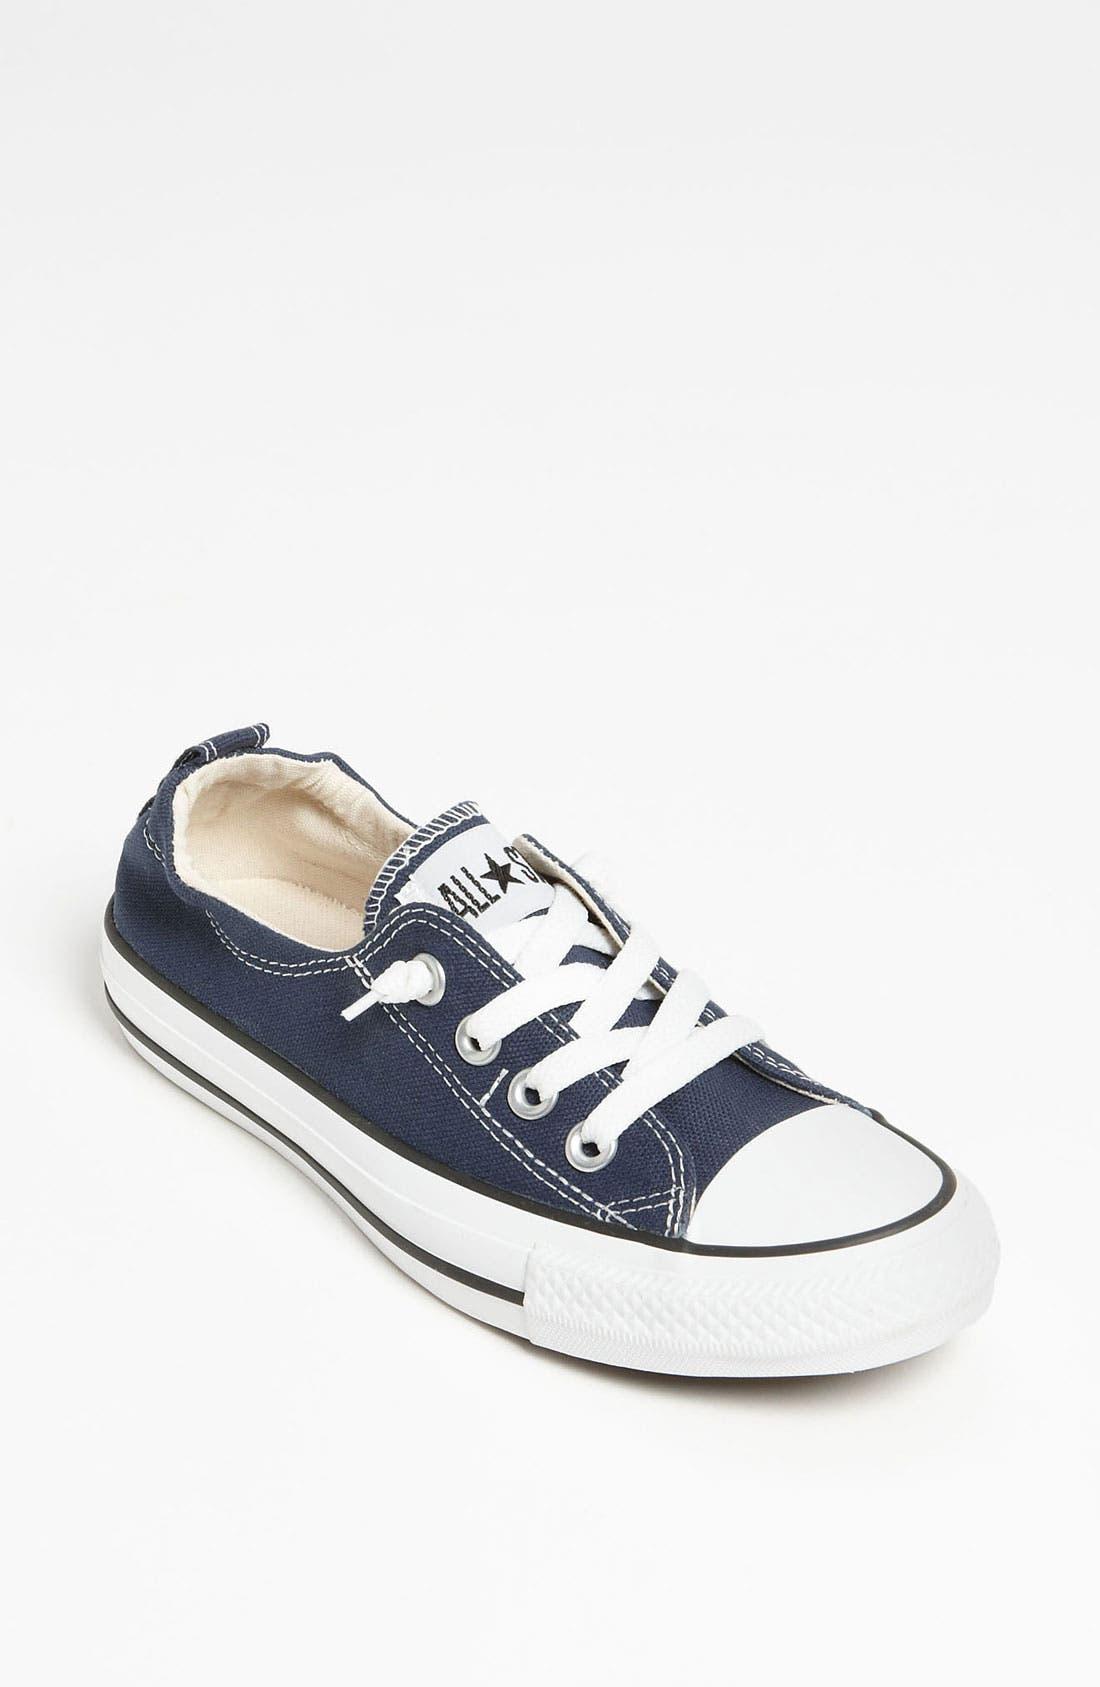 Chuck Taylor<sup>®</sup> 'Shoreline' Sneaker,                             Main thumbnail 1, color,                             NAVY